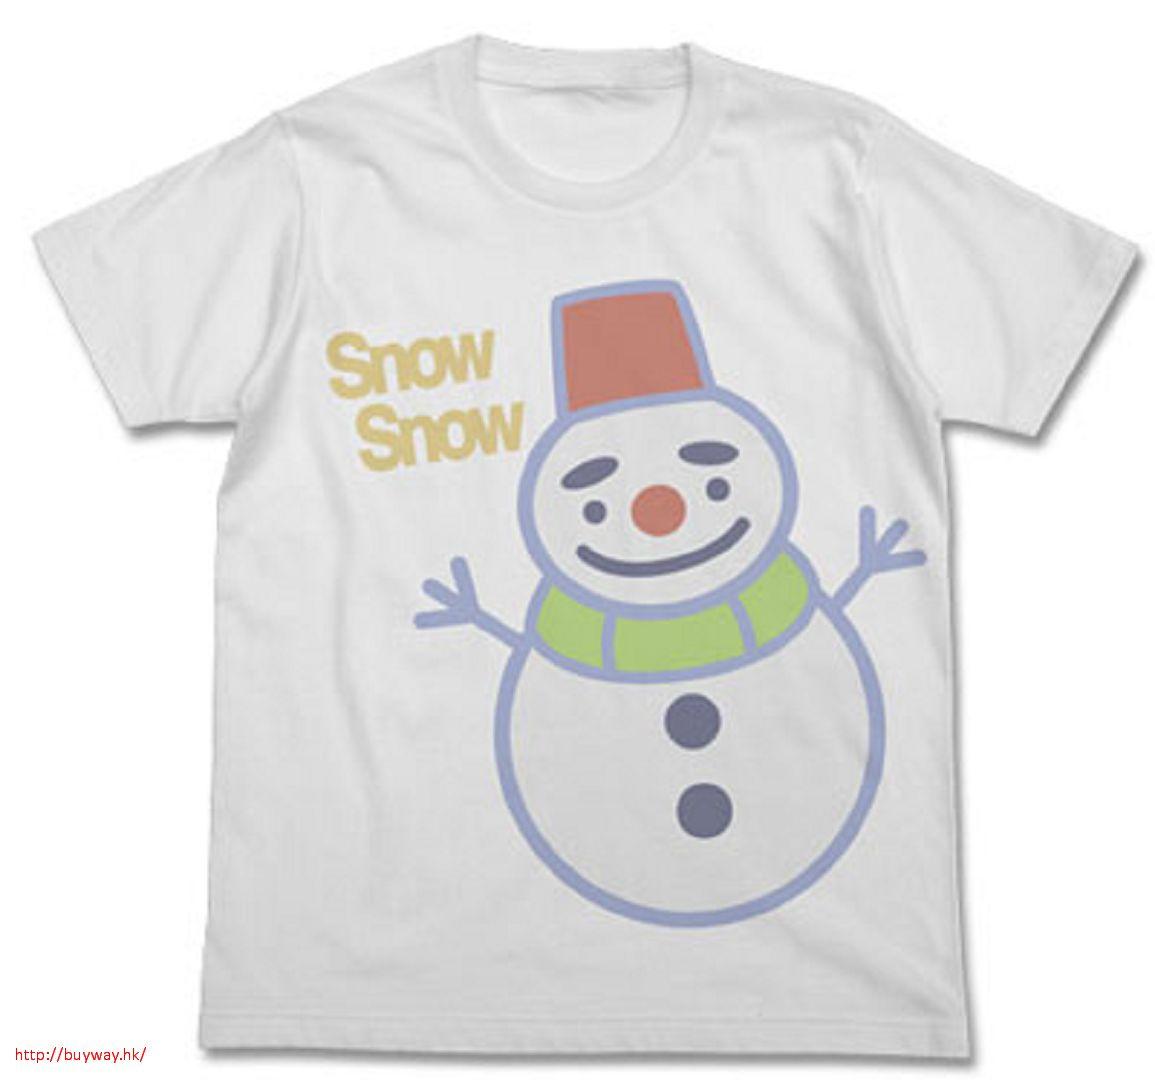 花牌情緣 (中碼) 「雪人丸」白色 T-Shirt Shinobu's Snow Maru T-Shirt / WHITE - M【Chihayafuru】